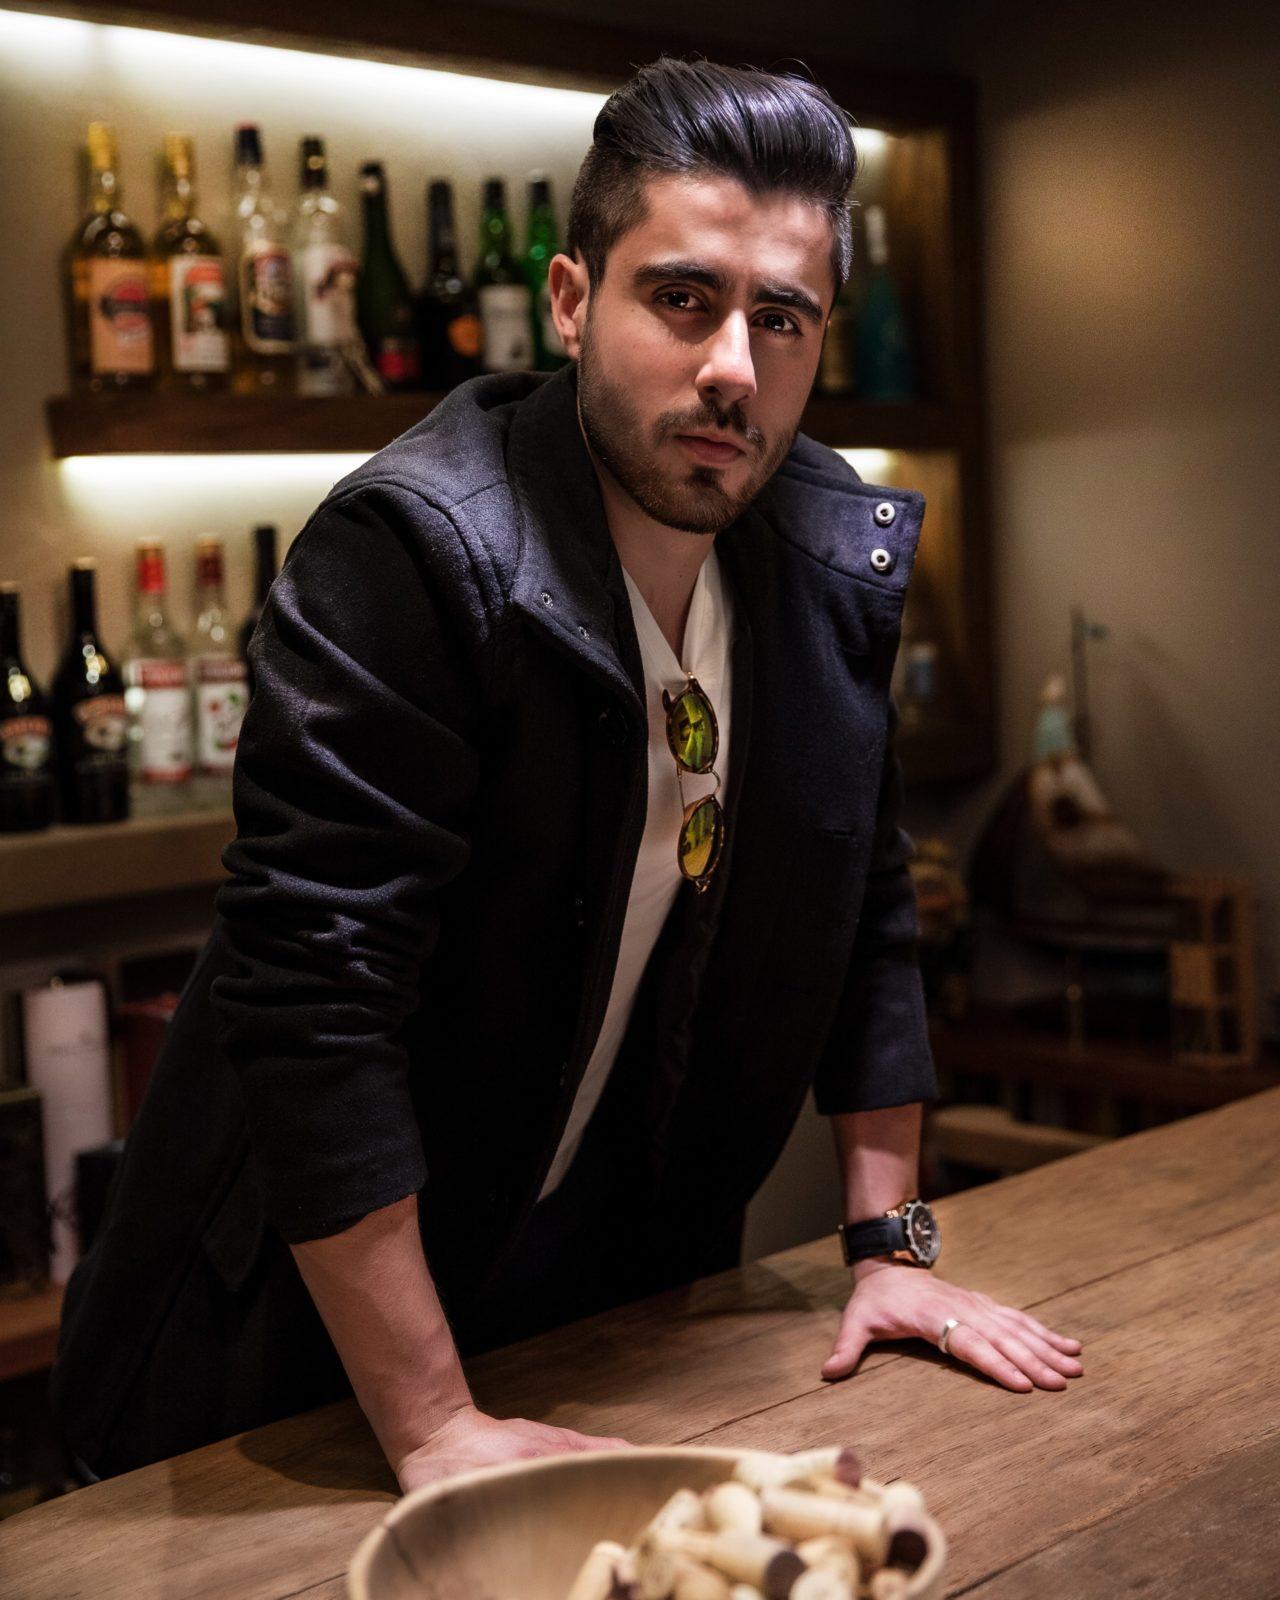 Foto-6-Sebastian-Castro-Musica-Musica-Sebastian_Castro-Pop-Urbana-Mexico-2020-Influencer-Artista-Cantante-Singer-min